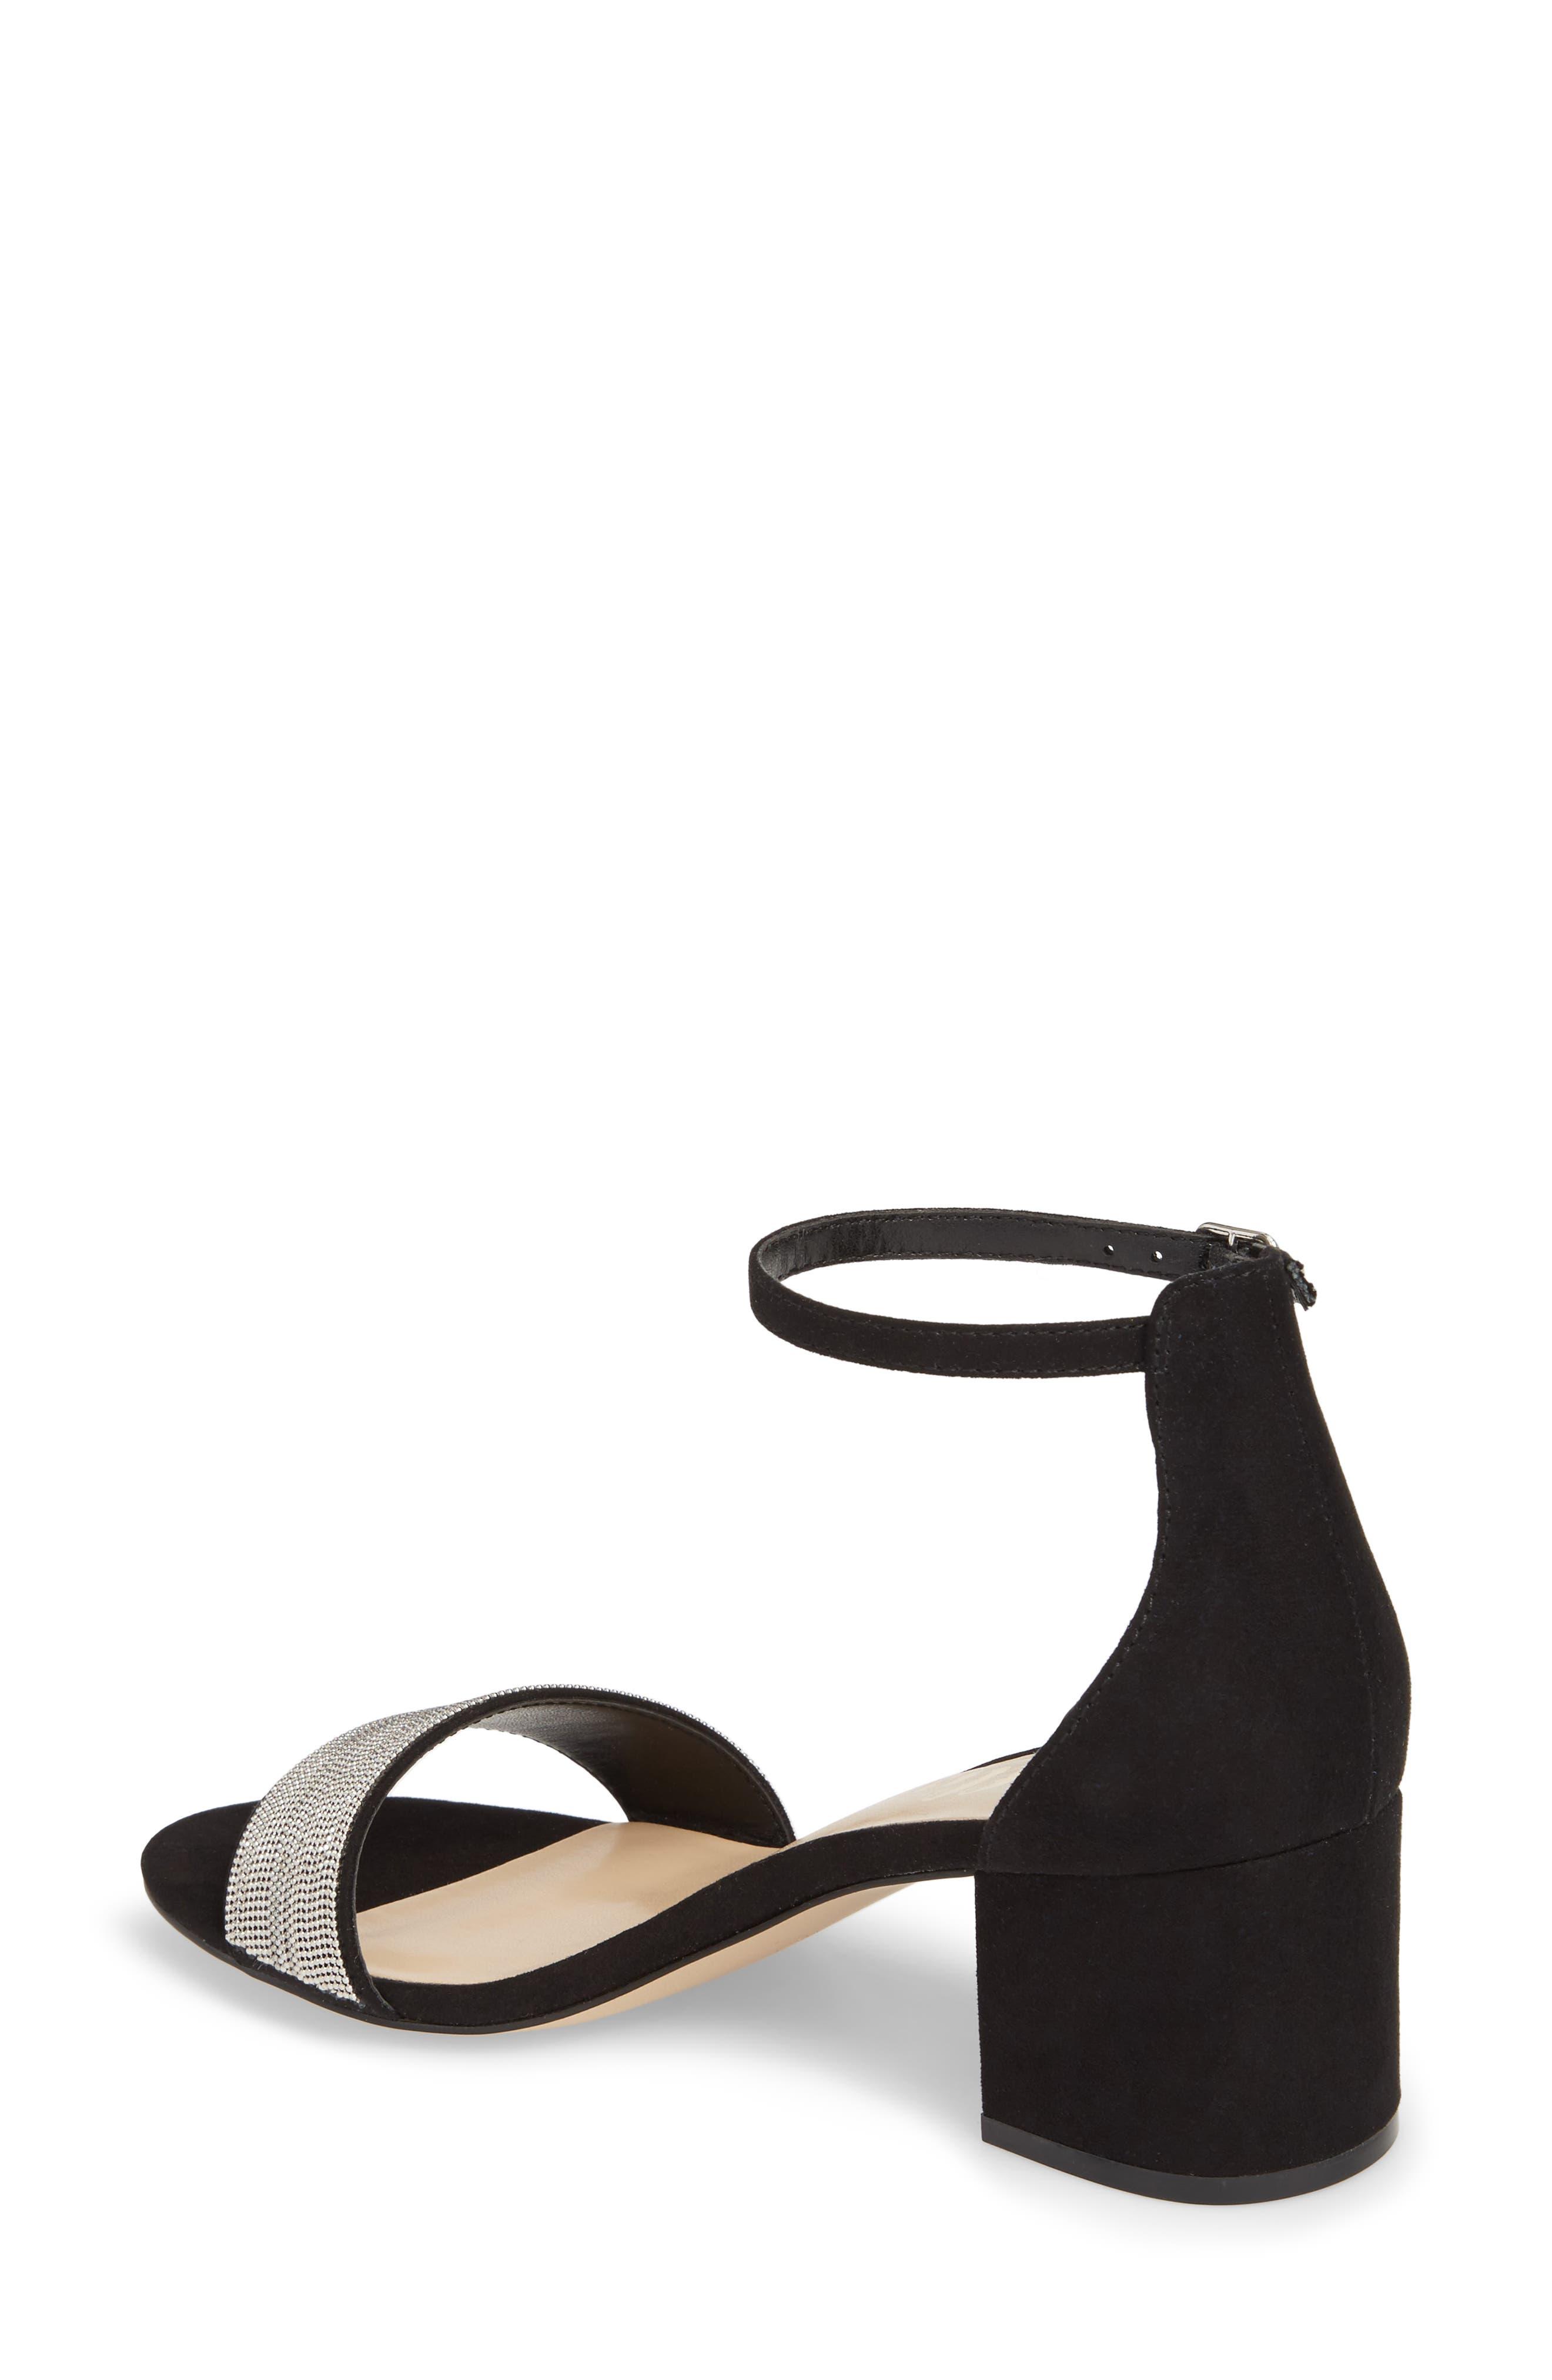 Jazmine Ankle Strap Sandal,                             Alternate thumbnail 2, color,                             Black Suede